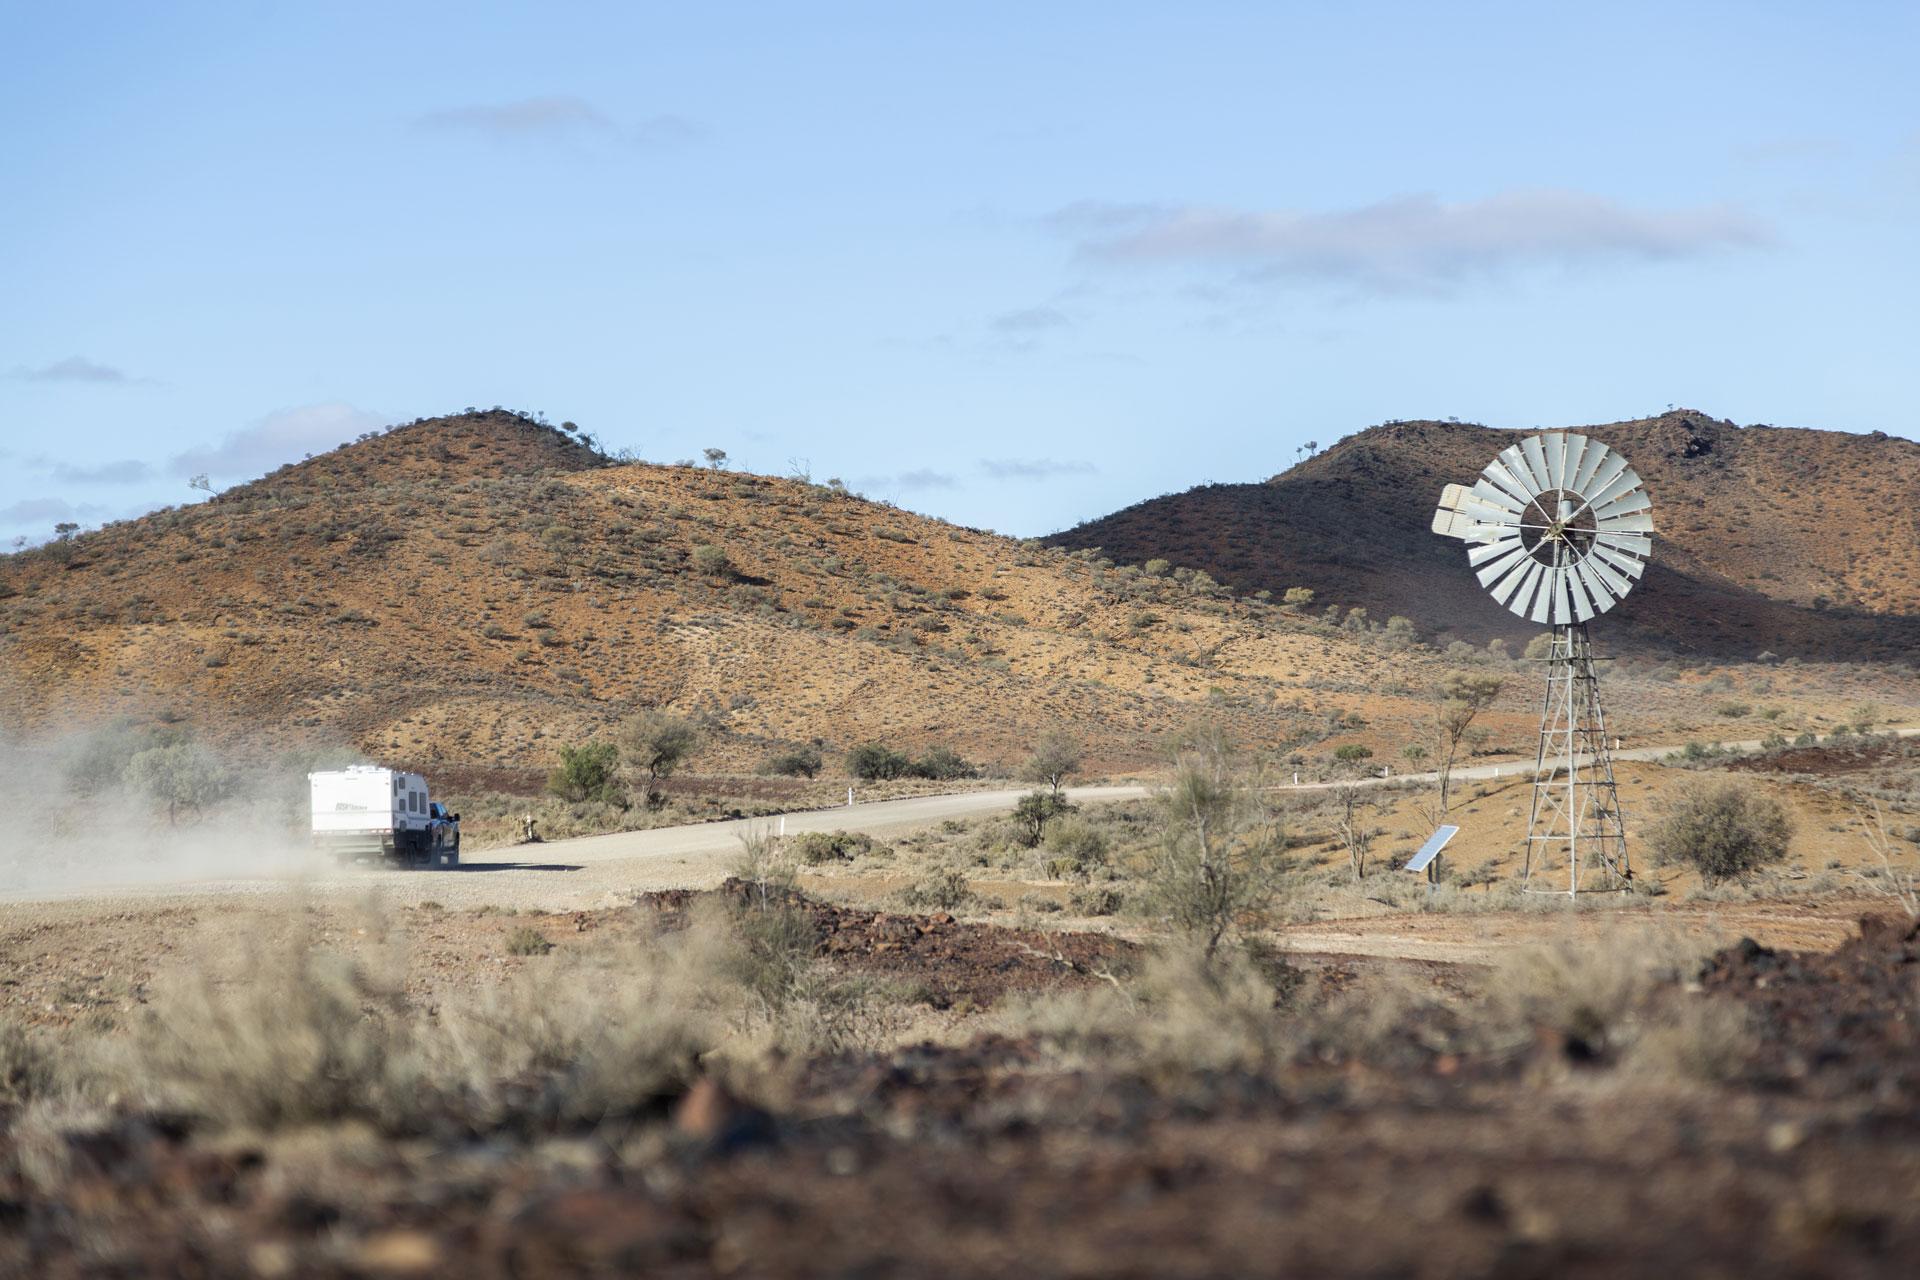 Bushtracker Australian Outback Caravans